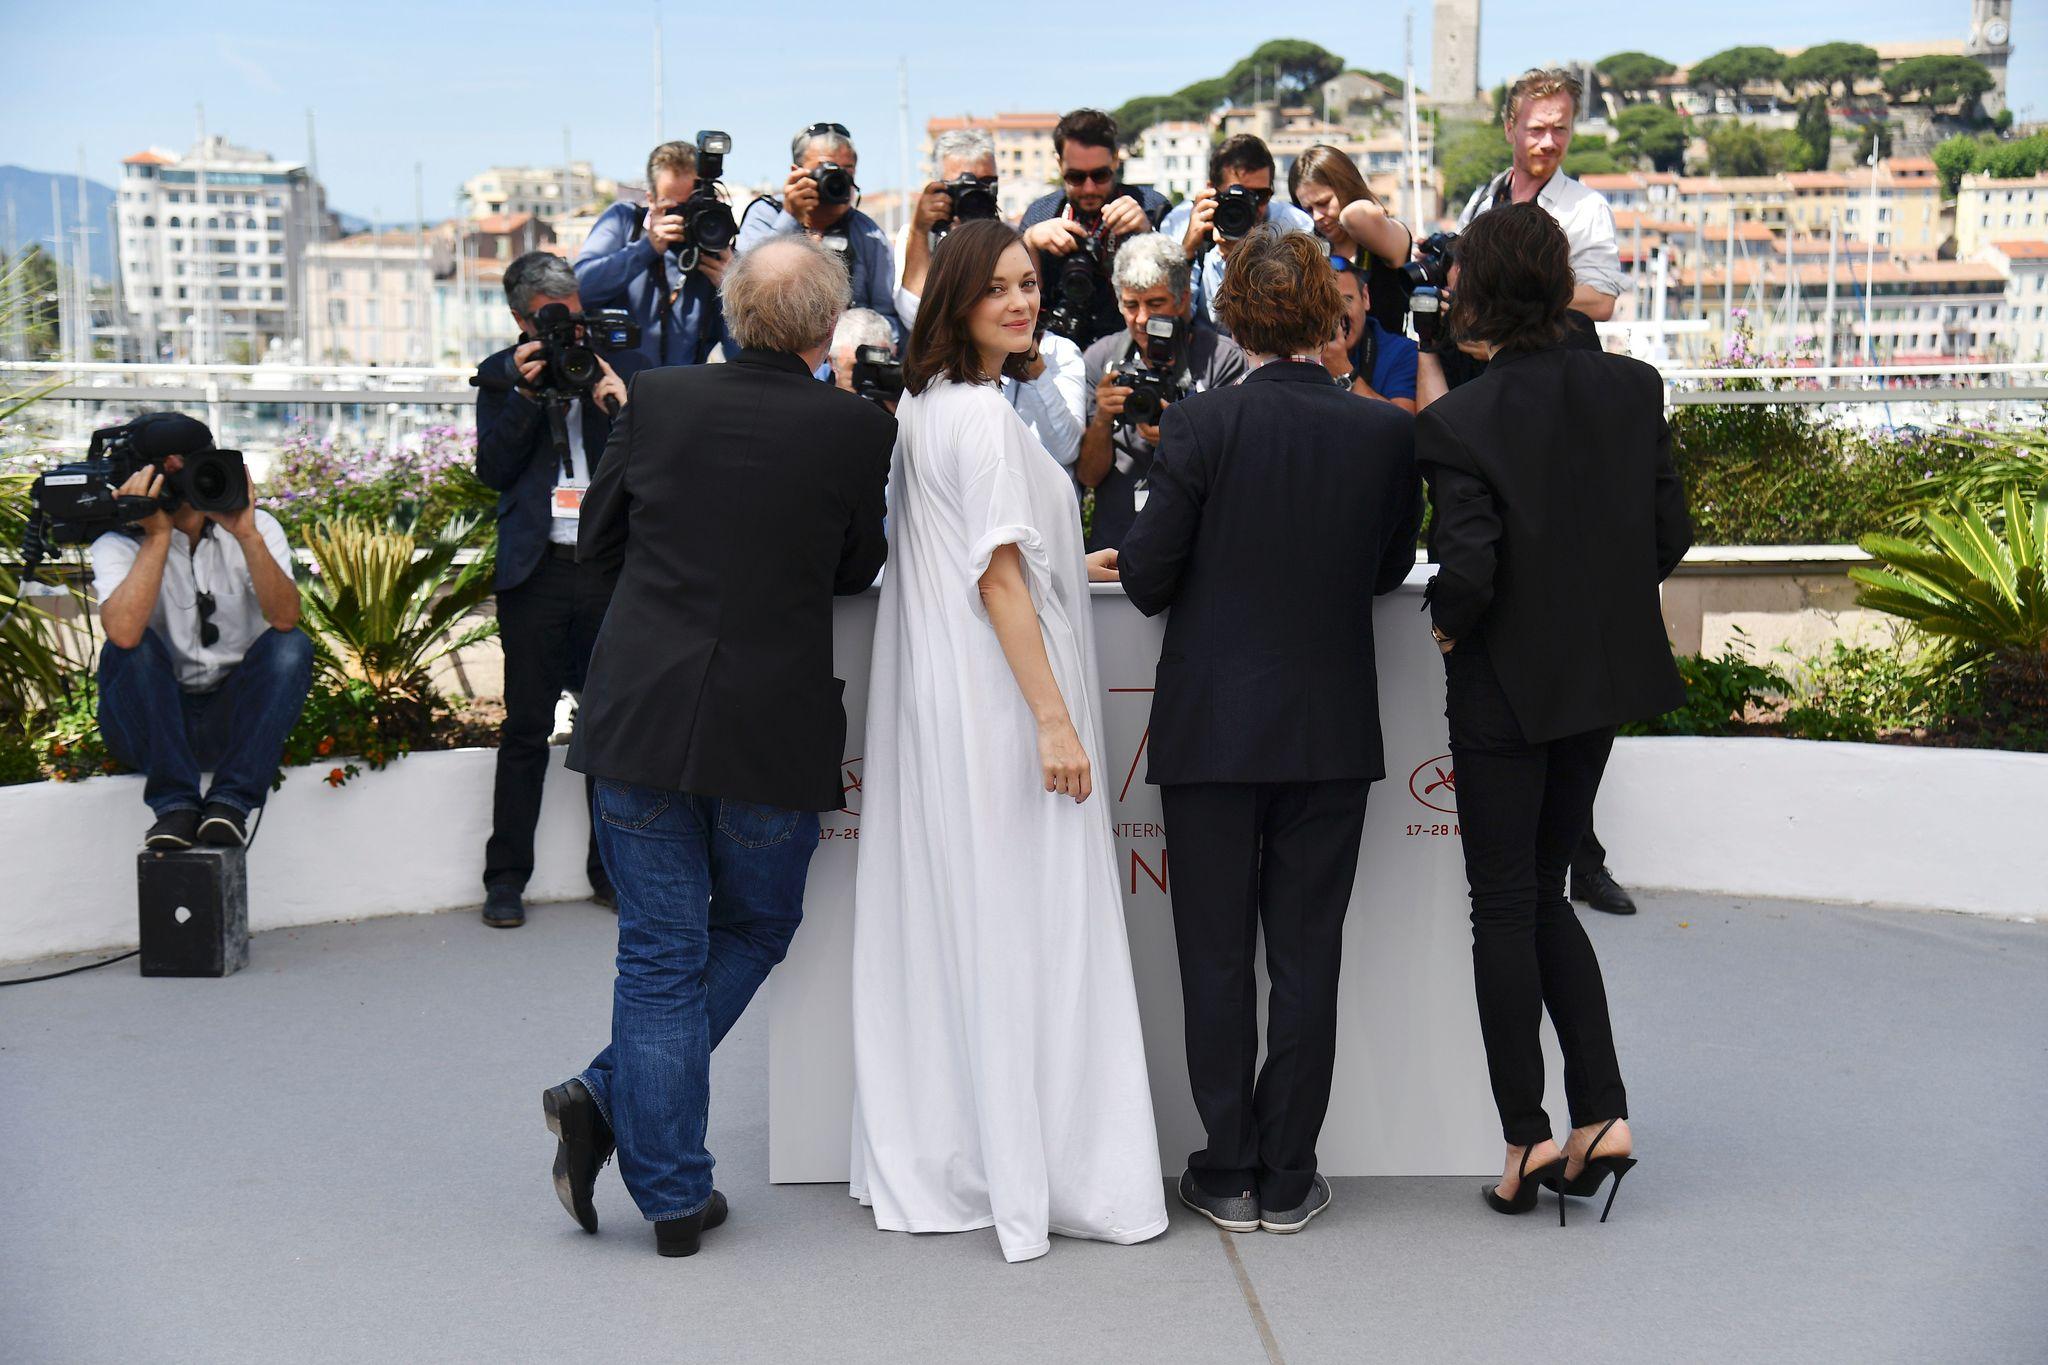 Charlotte Gainsbourg, Mathieu Amalric, Marion Cotillard, and Arnaud Desplechin